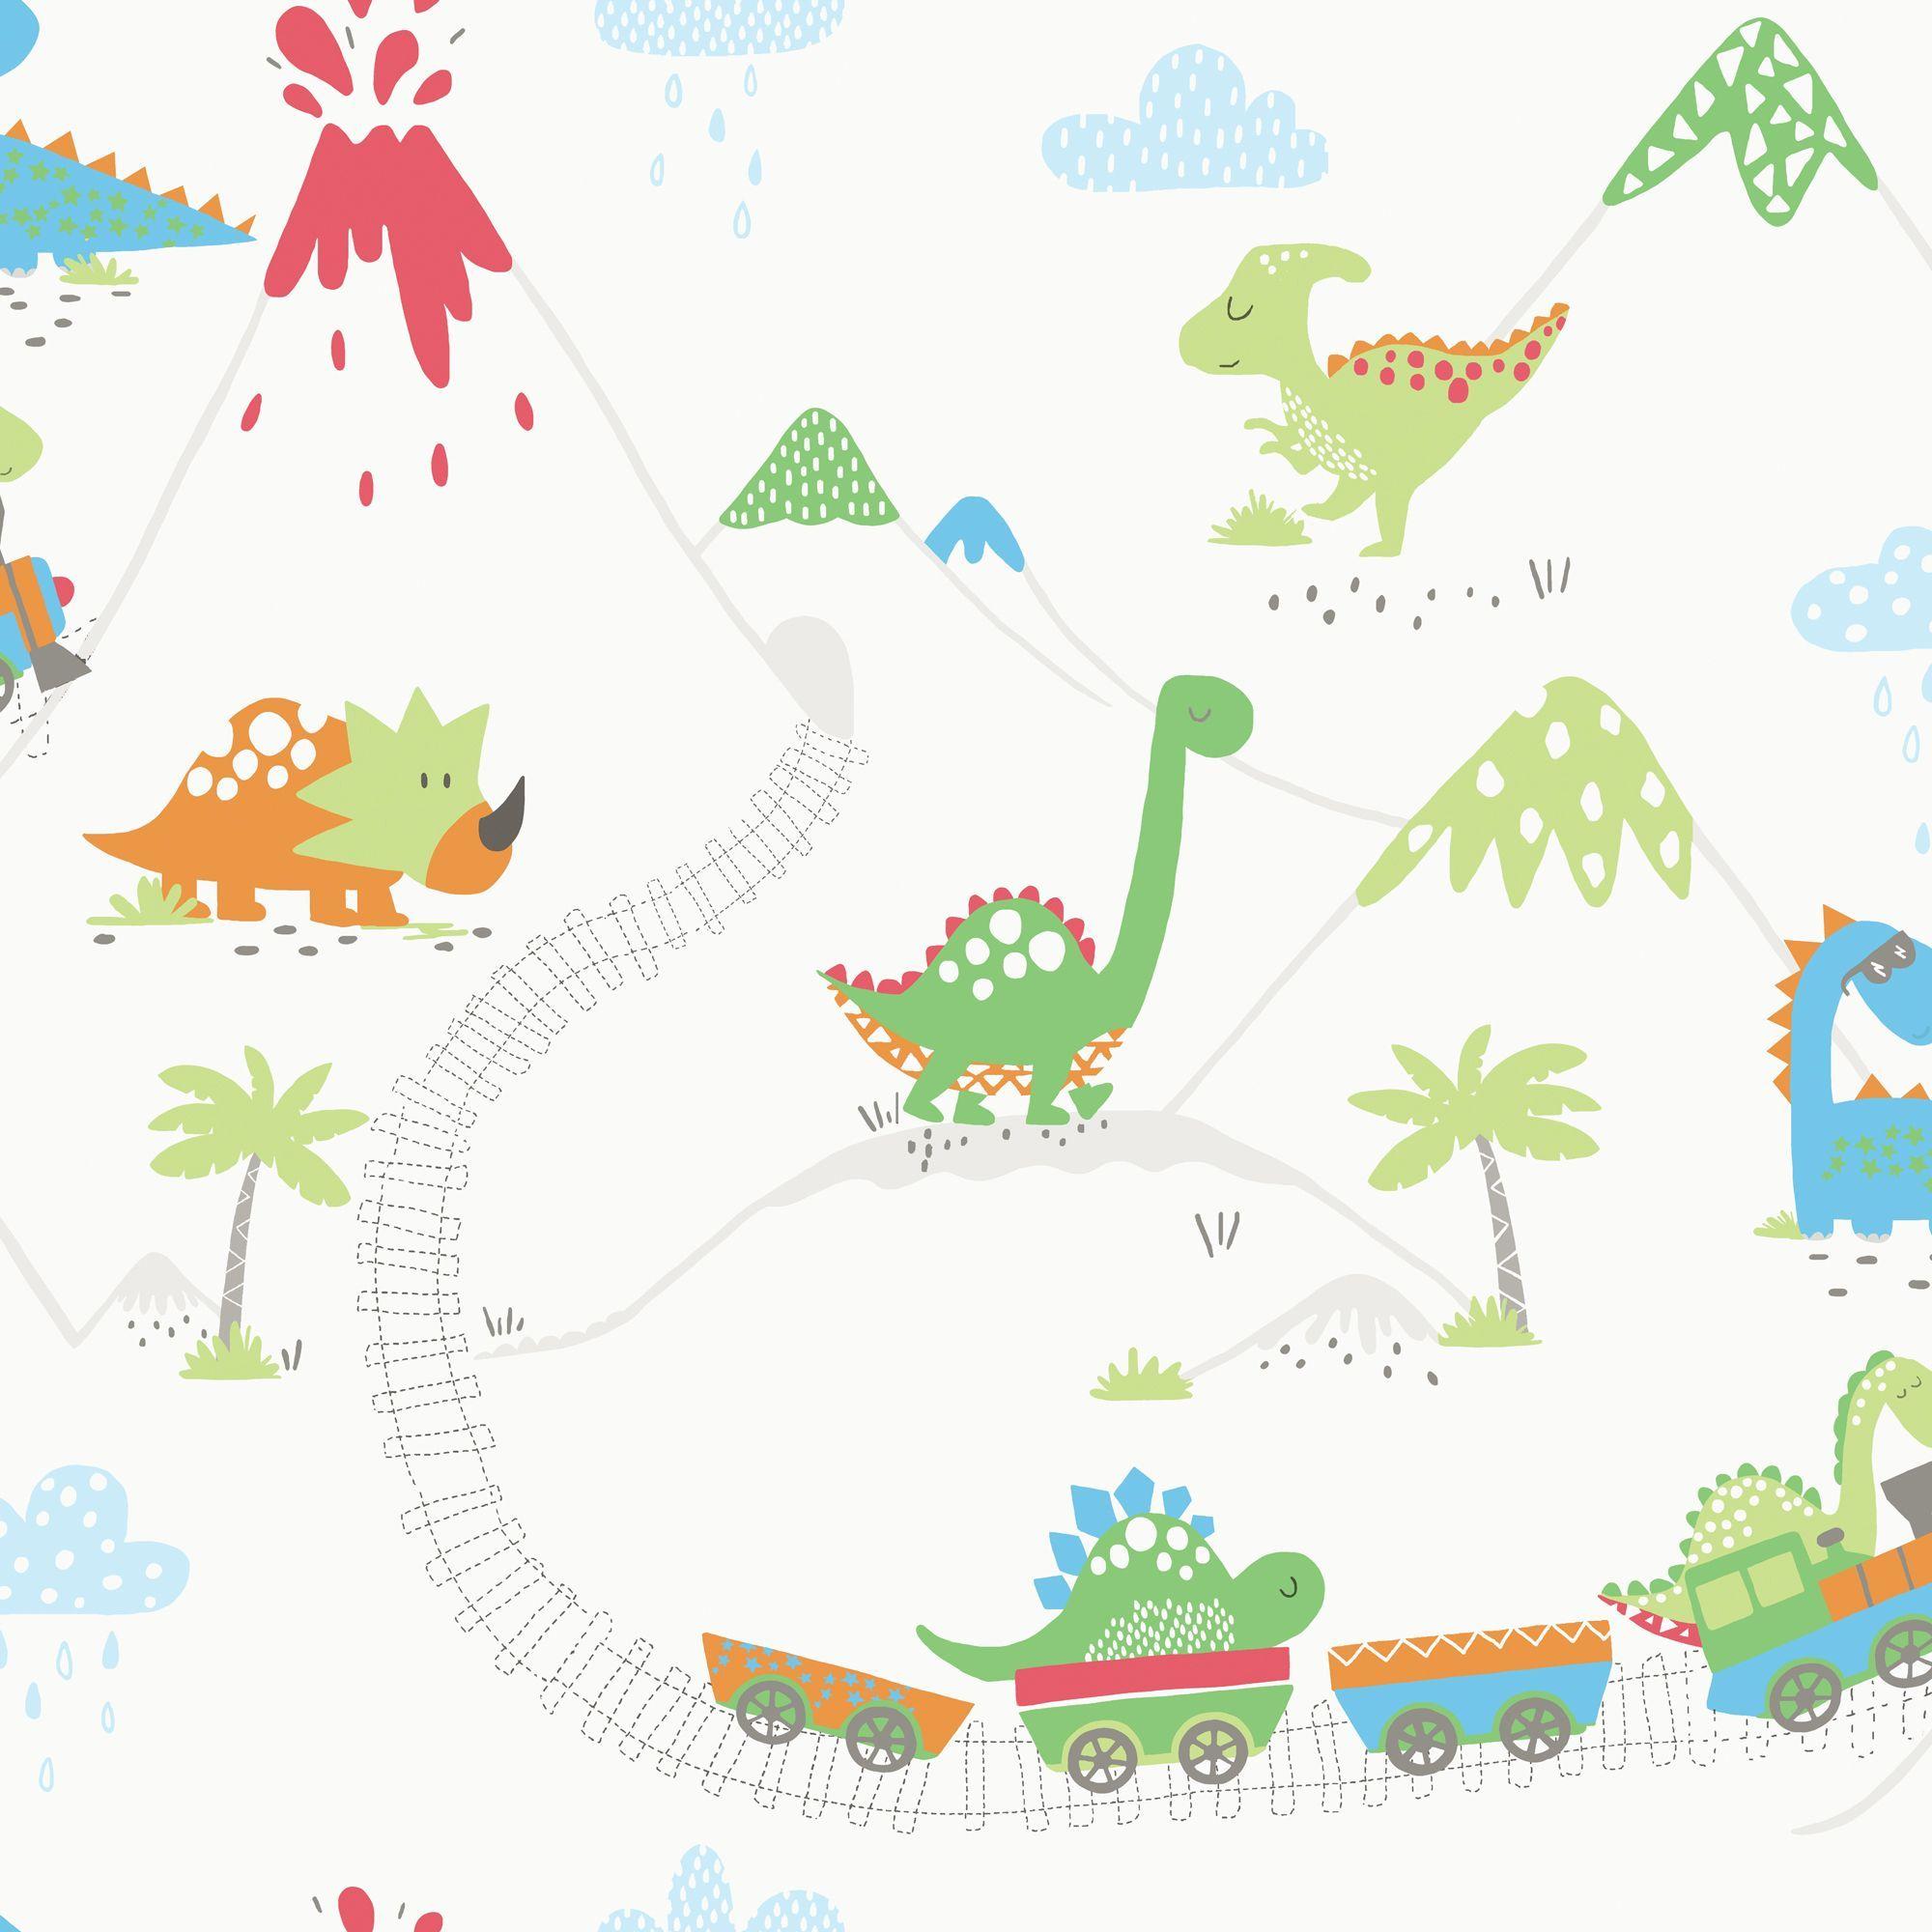 Holden Decor Dinosaur Matt Finish Wallpaper B Q For All Your Home And Garden Supplies And Advice On All The L Dinosaur Wallpaper Kids Wallpaper Dinosaur Room Childrens bedroom wallpaper b&q